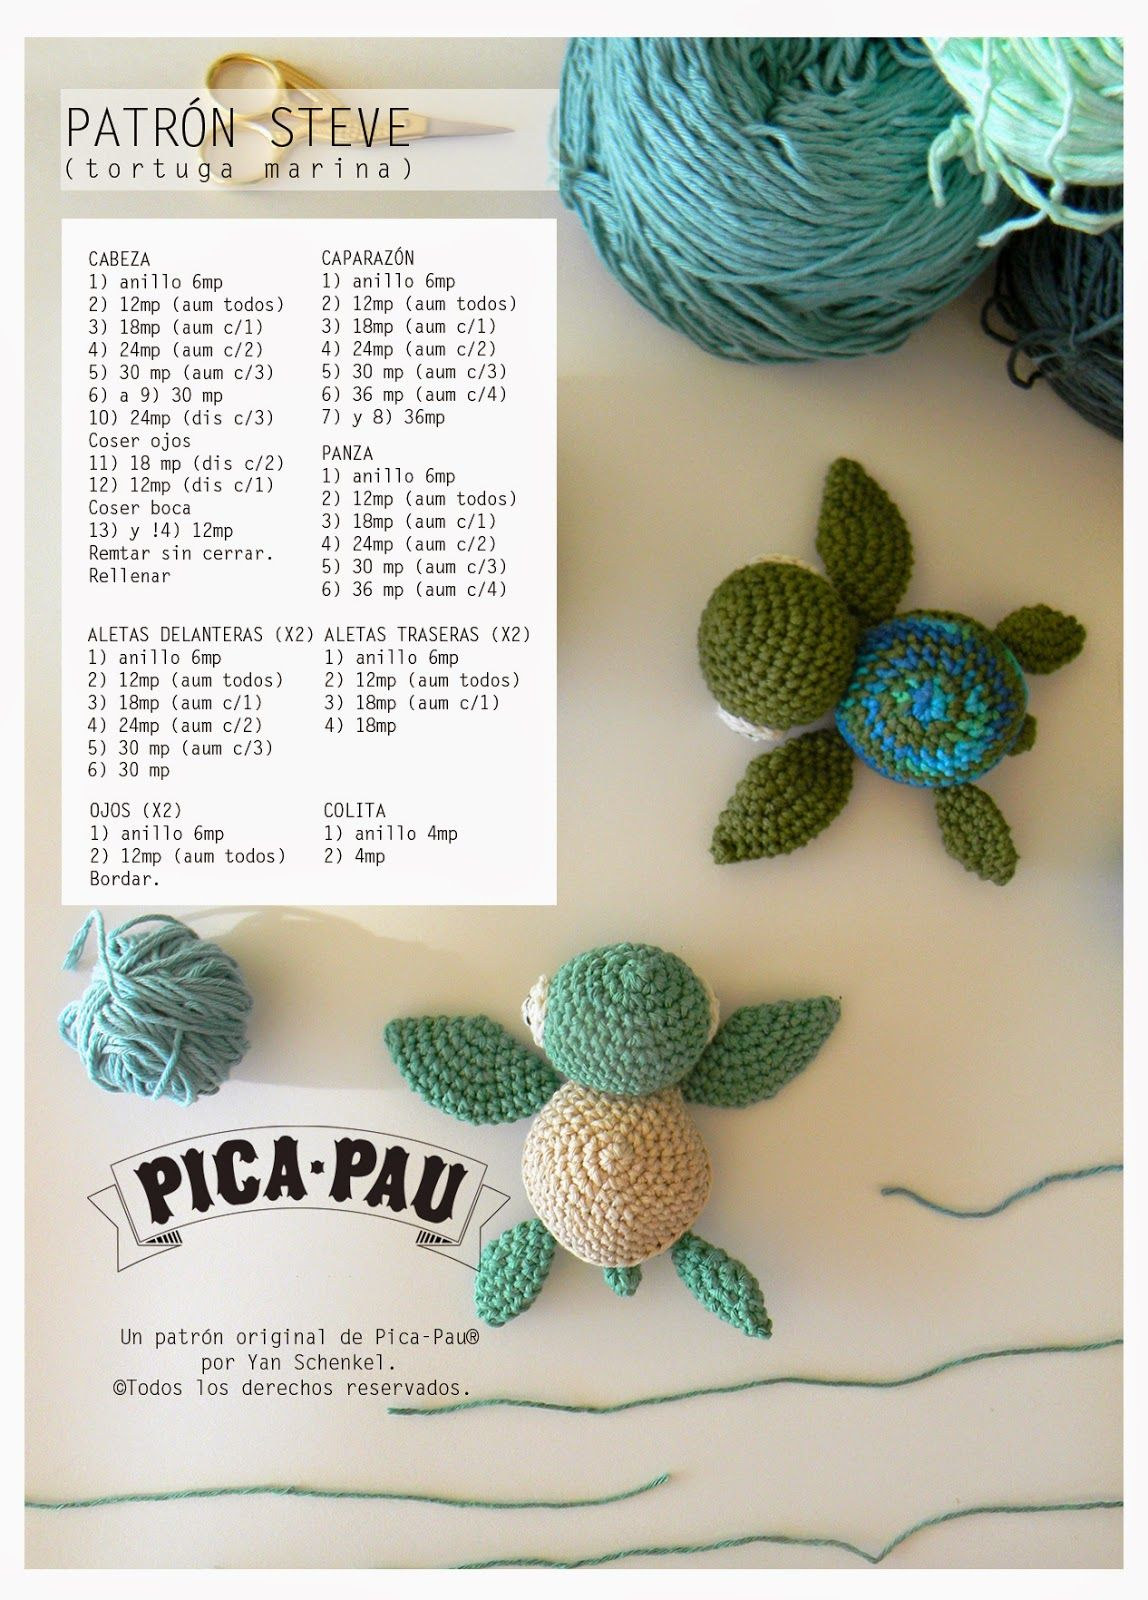 Pin by Aleksandra Lekic on Amigurumi free | Pinterest | Crochet ...